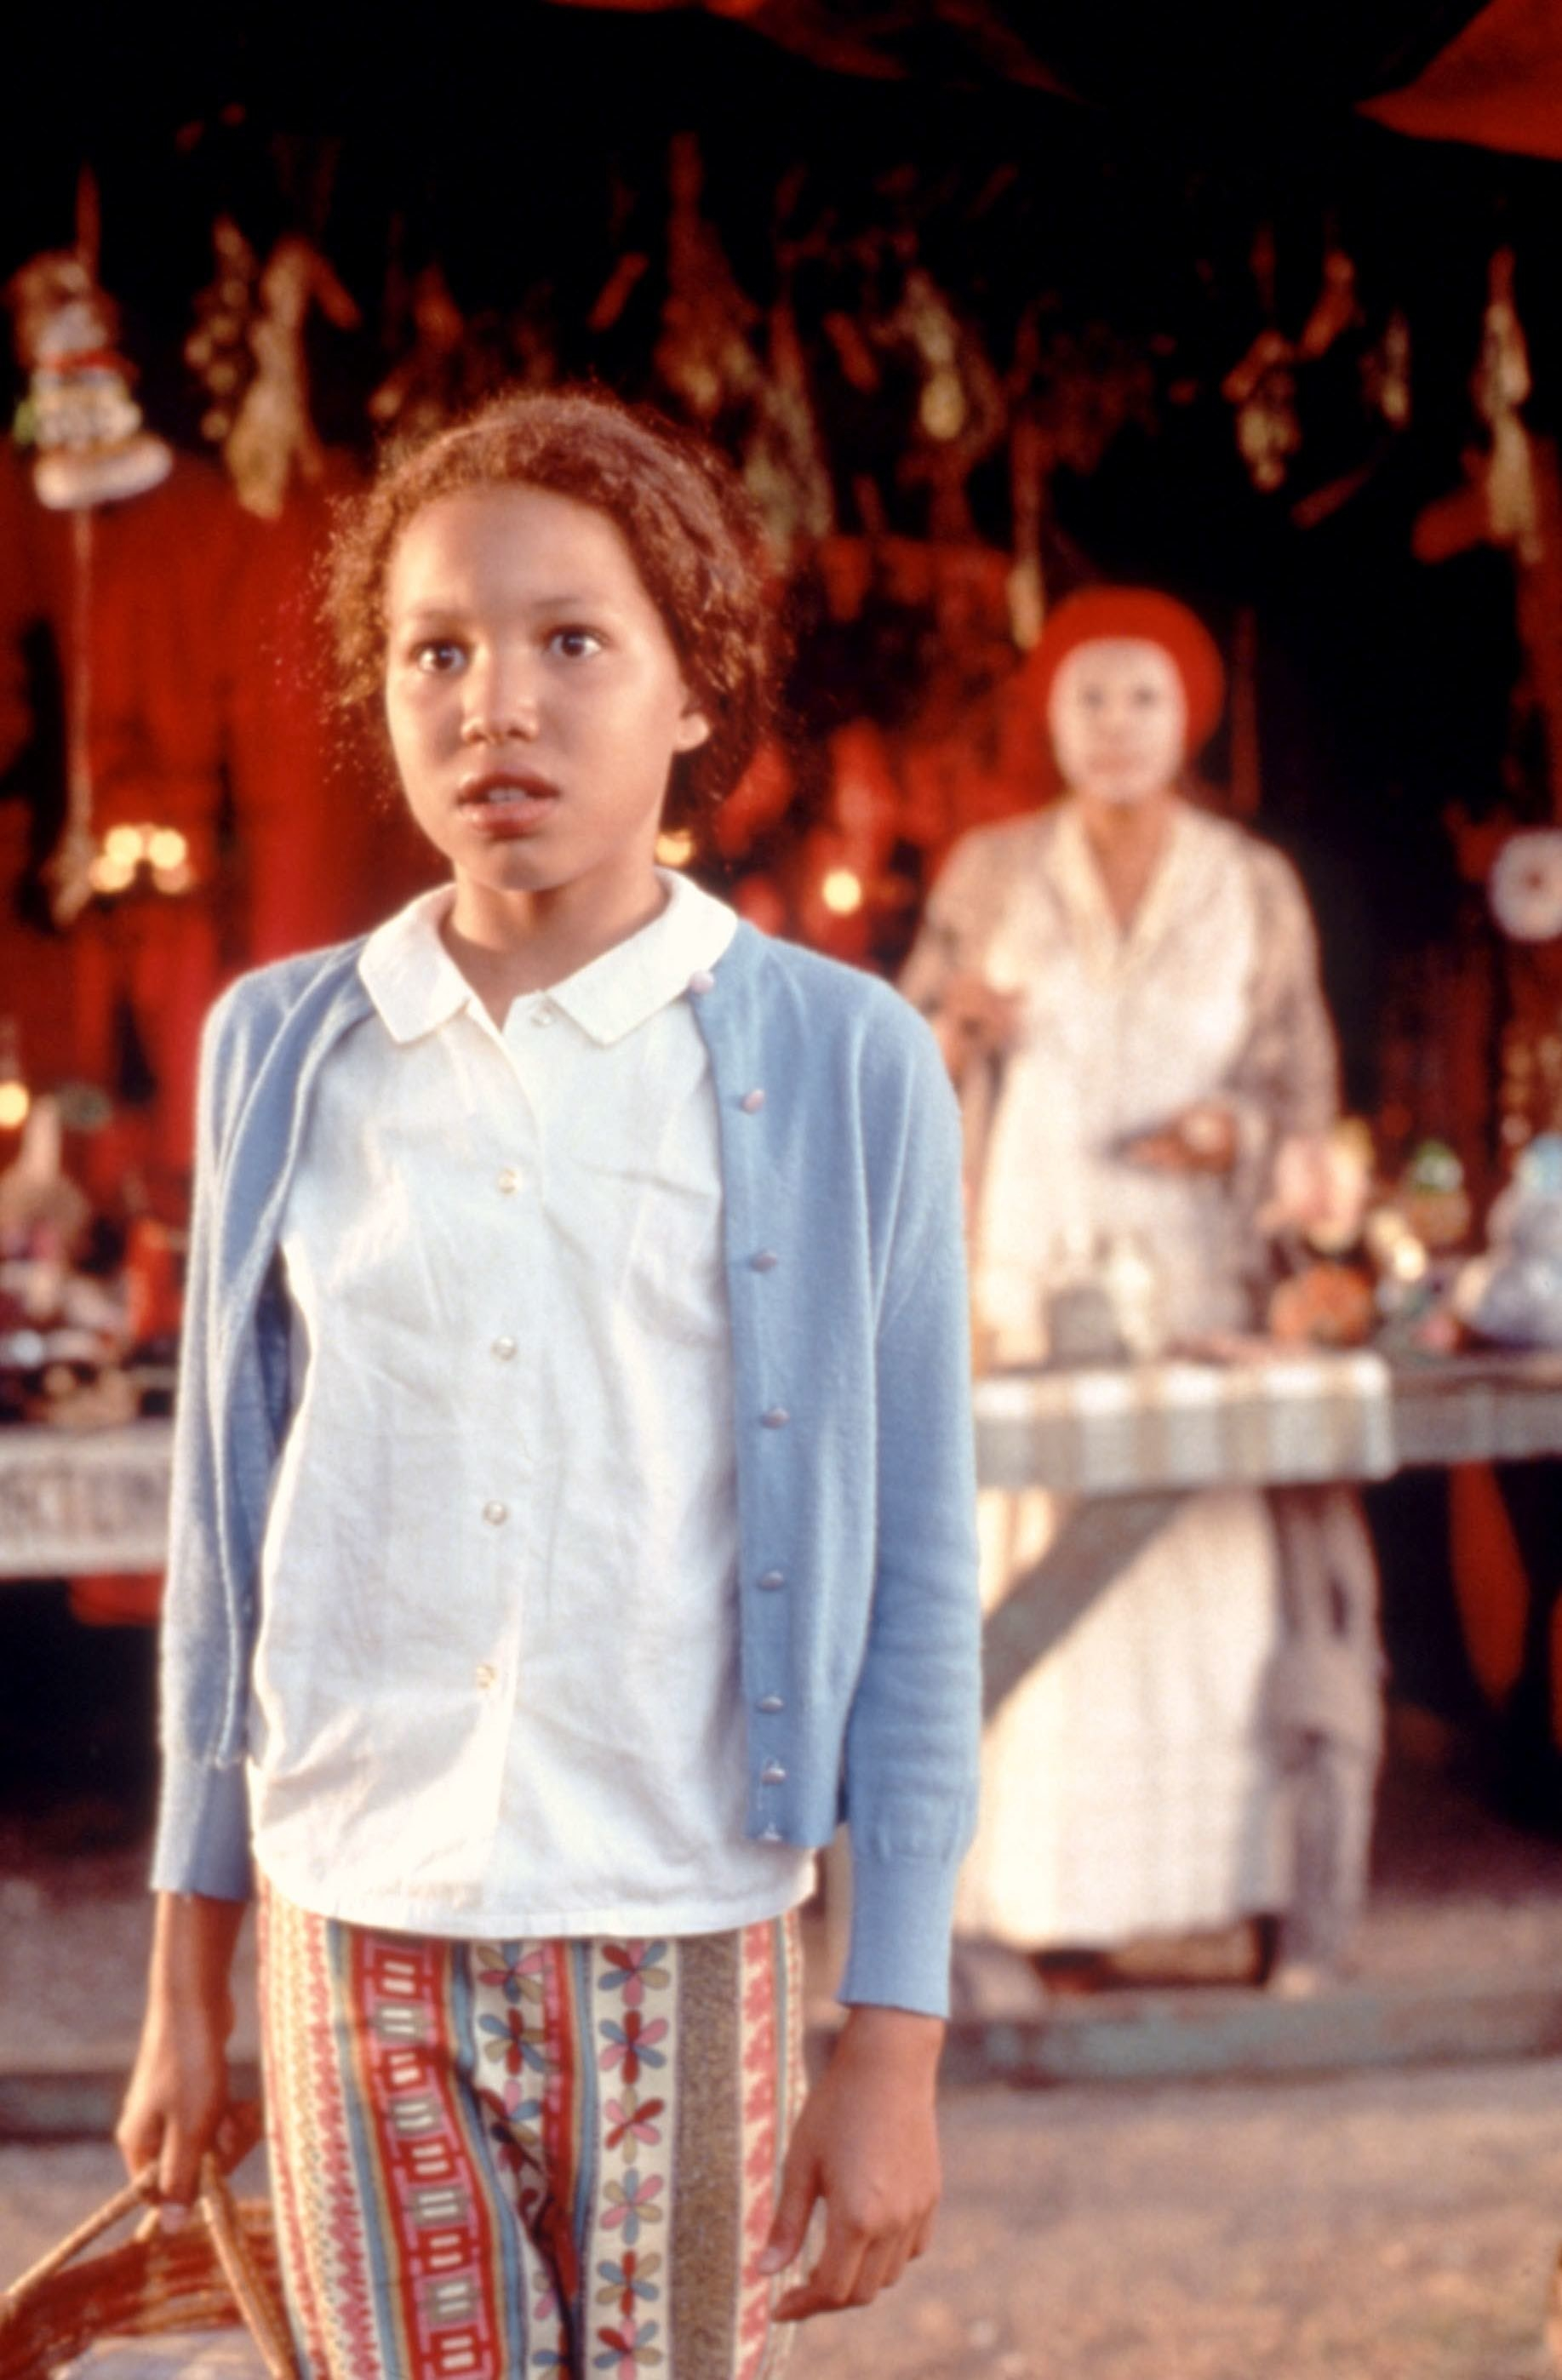 Jurnee Smollett as Eve in Eve's Bayou